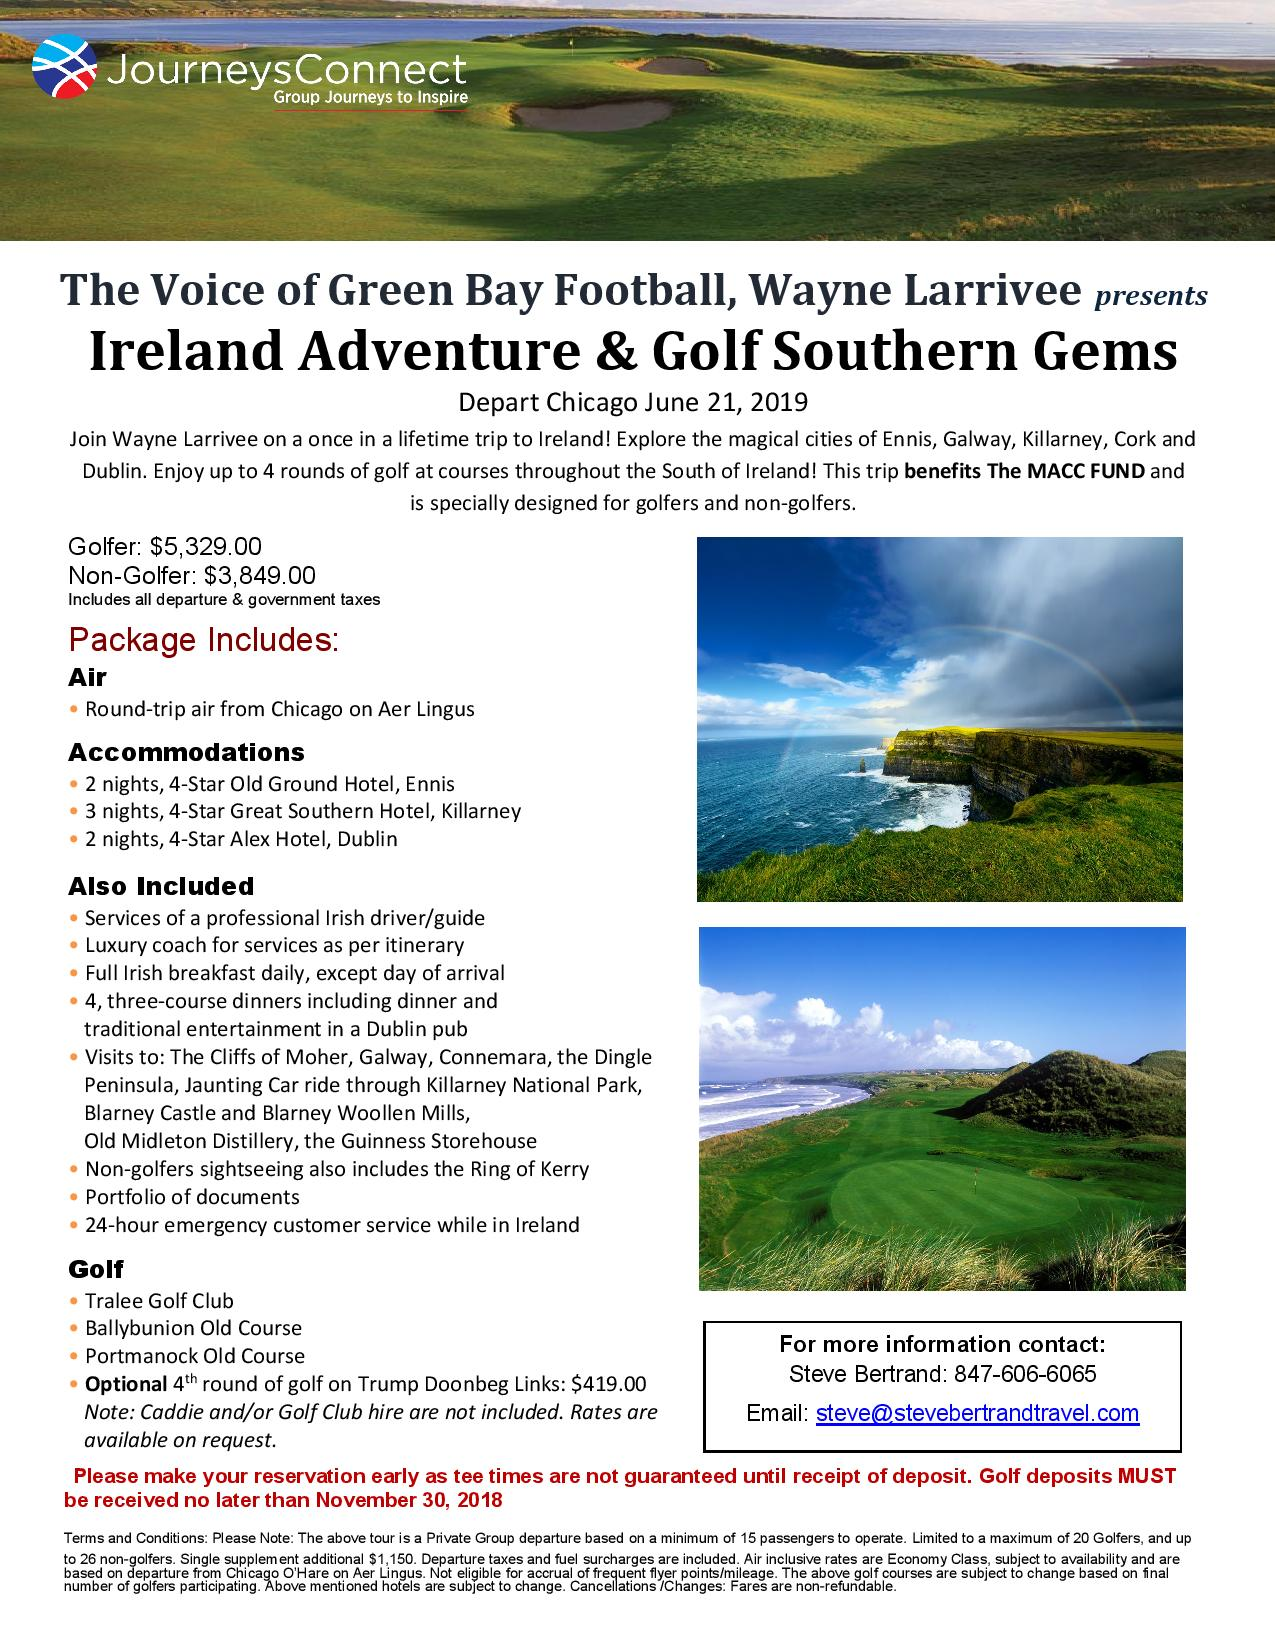 Wayne Larrivee Ireland Golf « SteveBertrandTravel